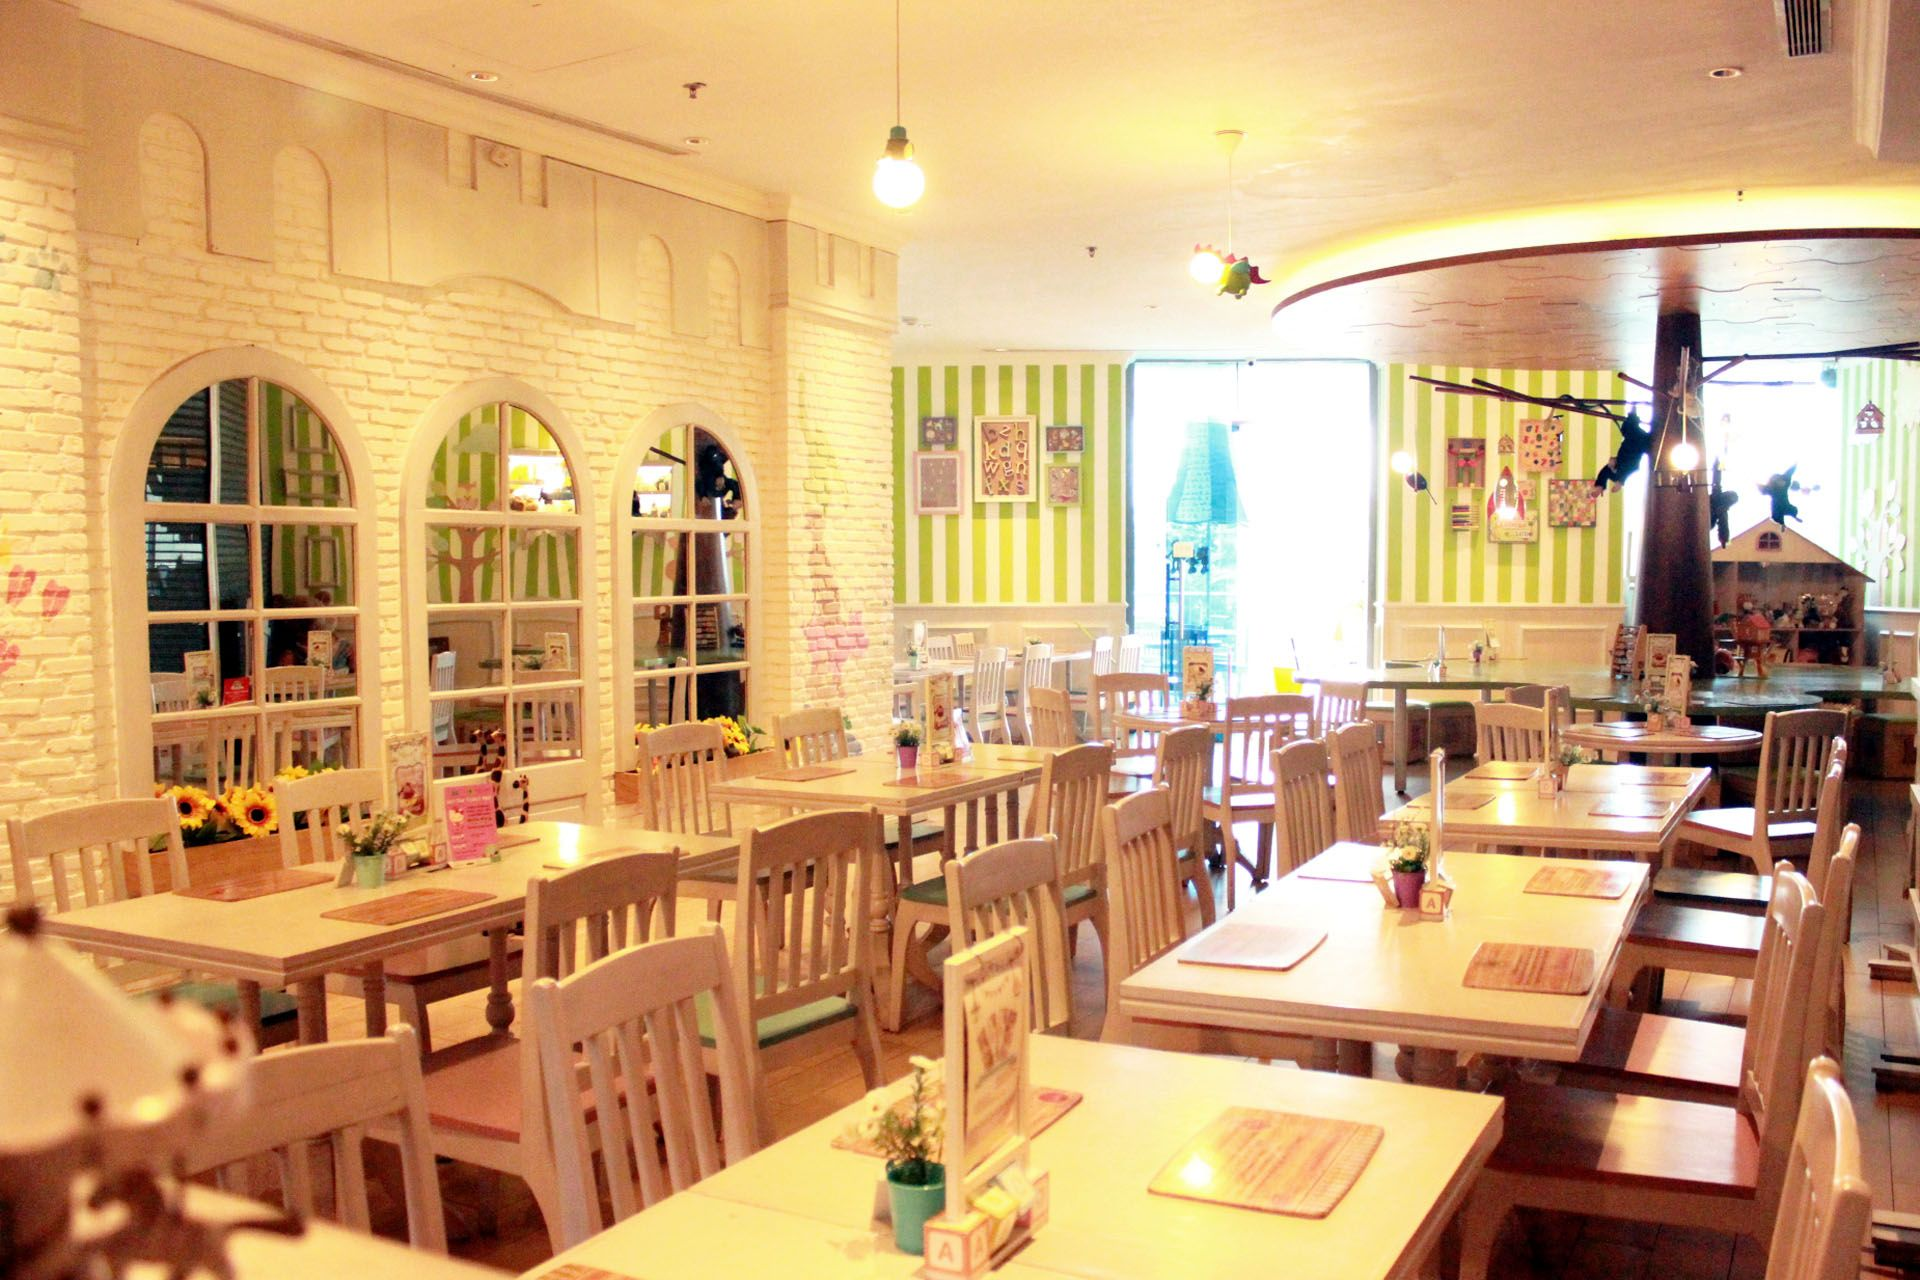 Nannys Pavillon  Playroom Kota Kasablanka, Ug Floor #Nannyspavillon #